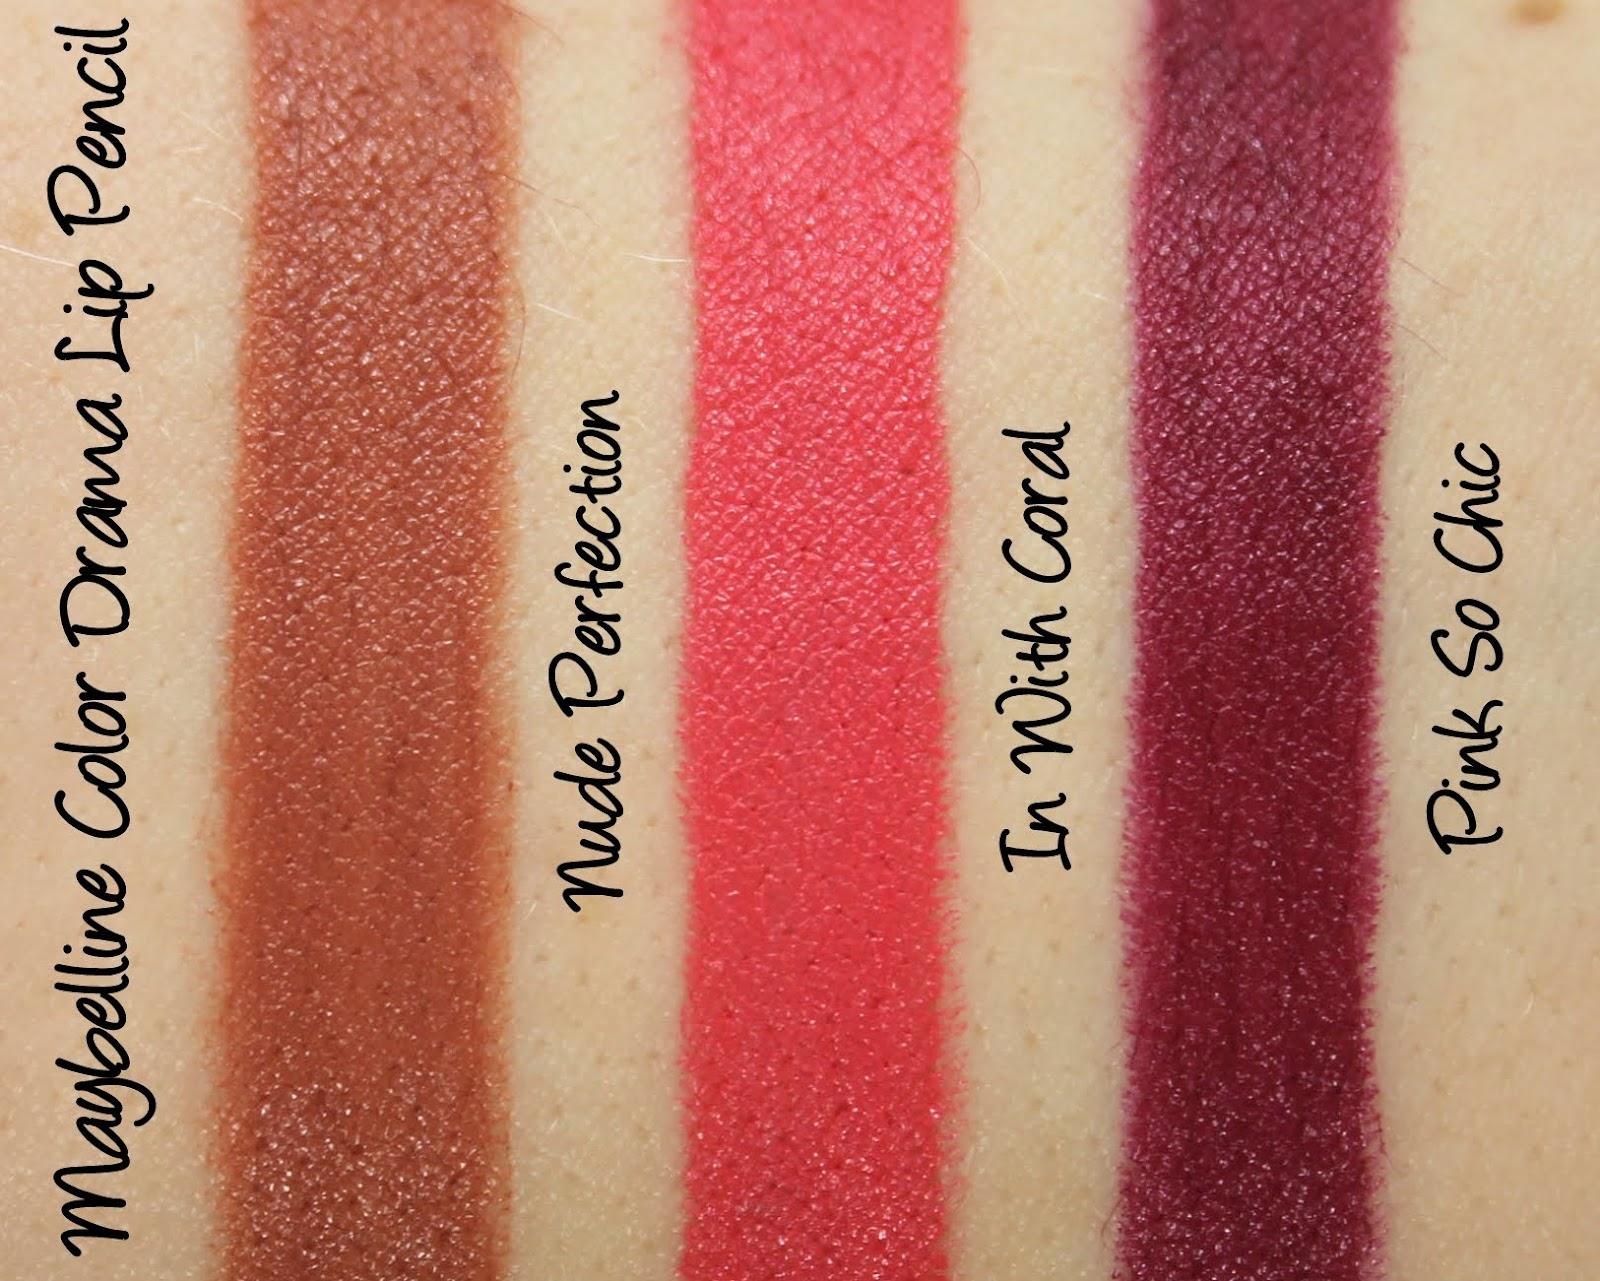 Color Sensational Mono Eyeshadow by Maybelline #16